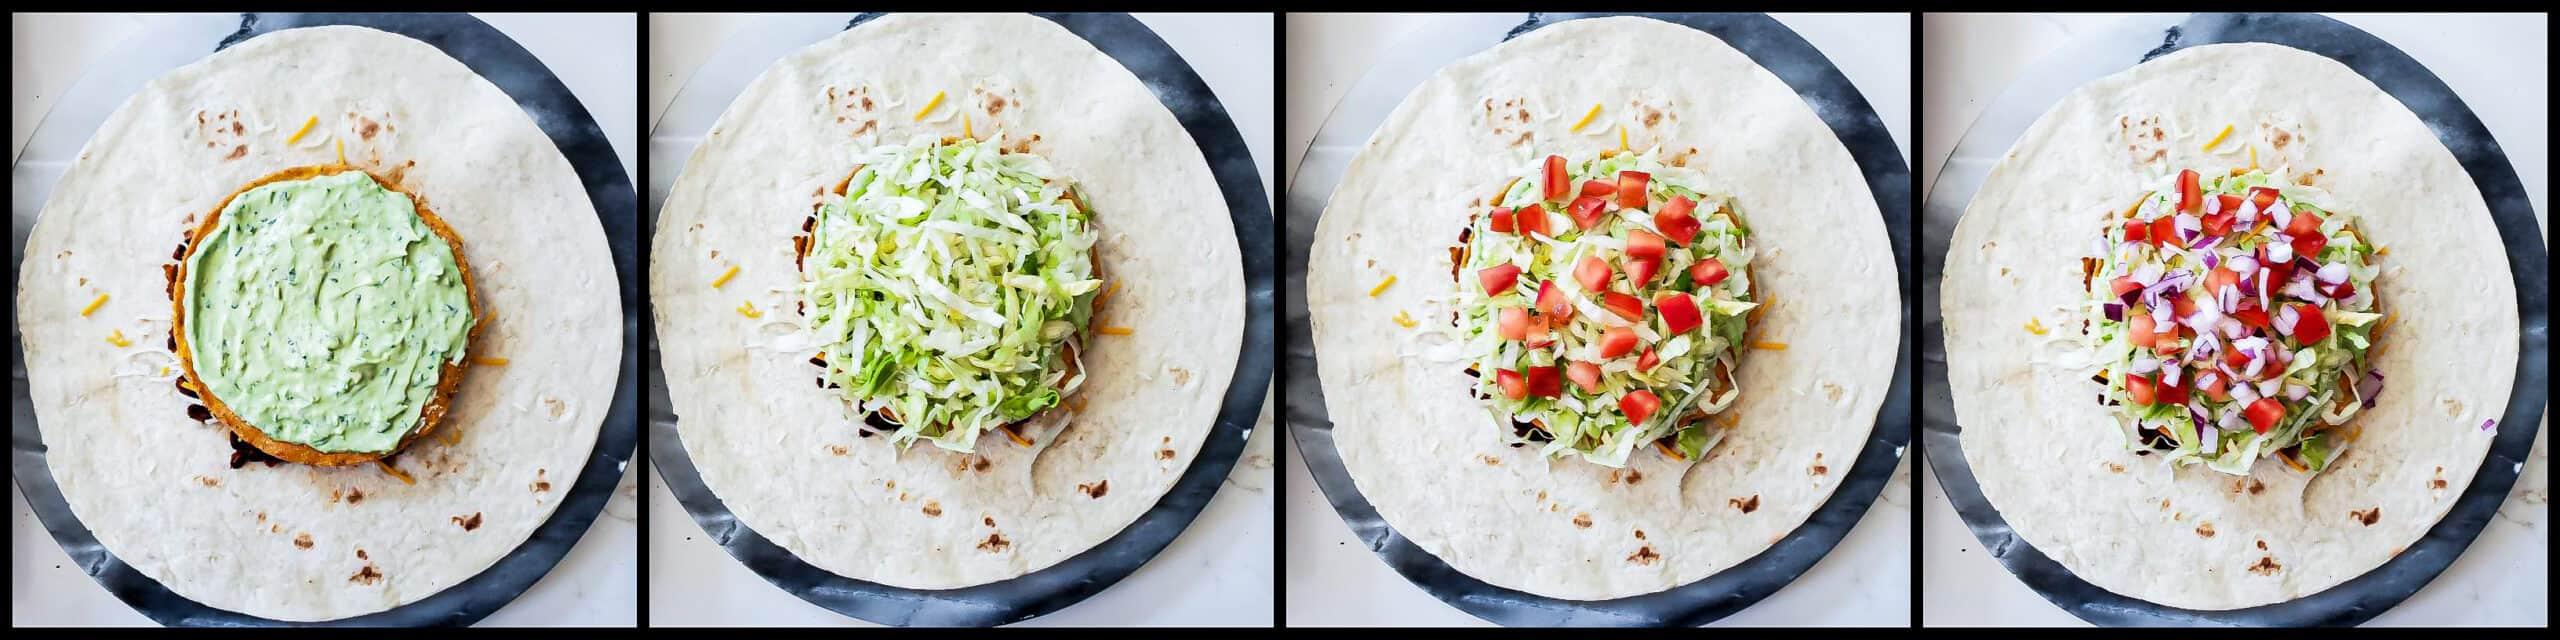 Vegetarian Crunch Wrap - step4